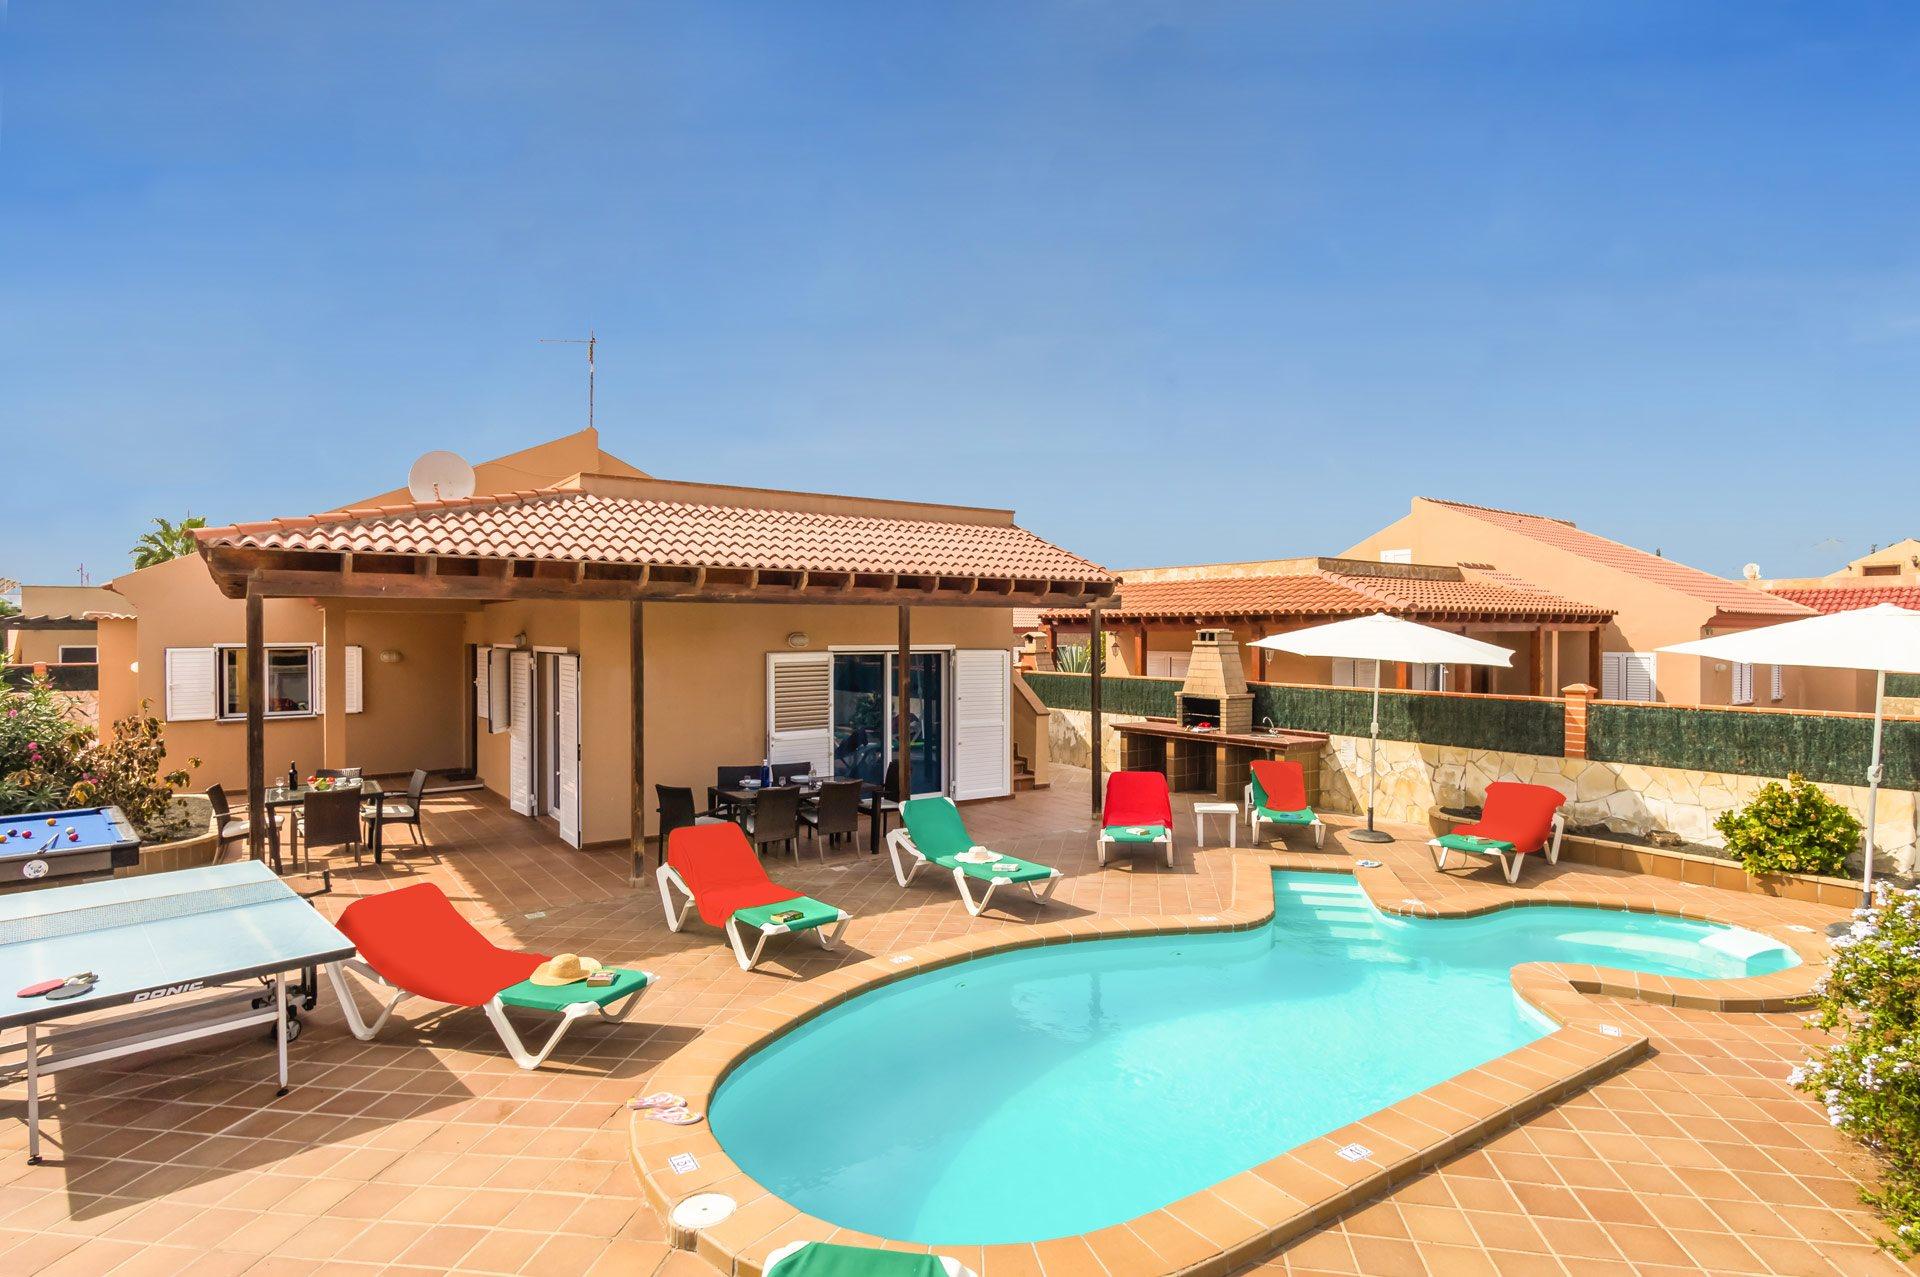 Villa Princesa, Corralejo, Fuerteventura